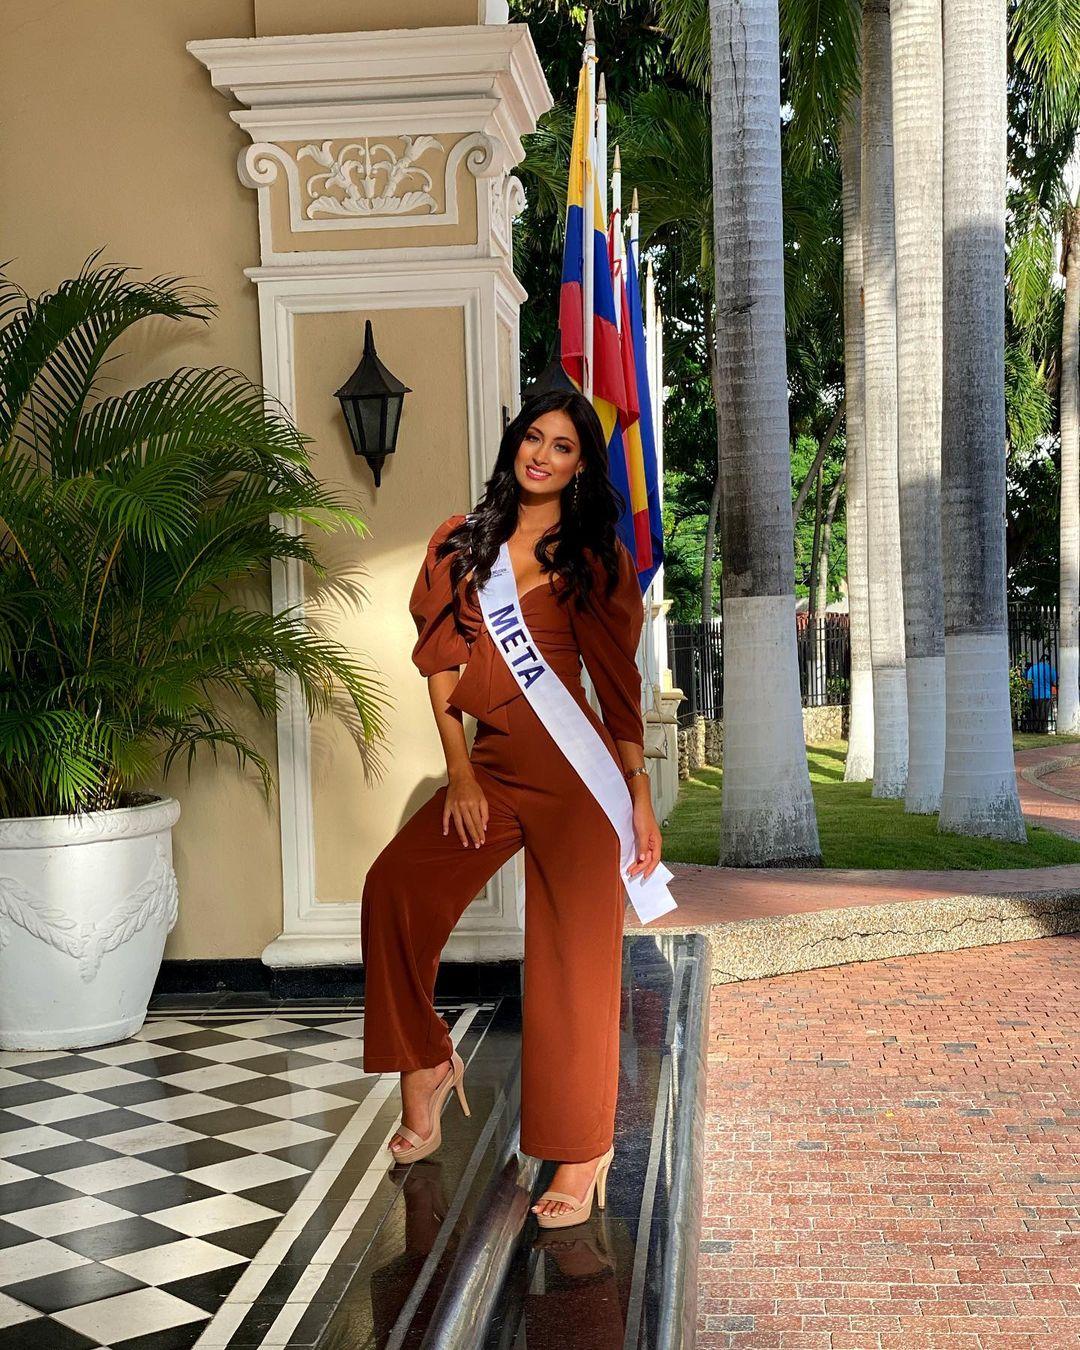 juliana franco, top 16 de miss colombia universo 2020/miss earth water 2017. - Página 21 Julifr23